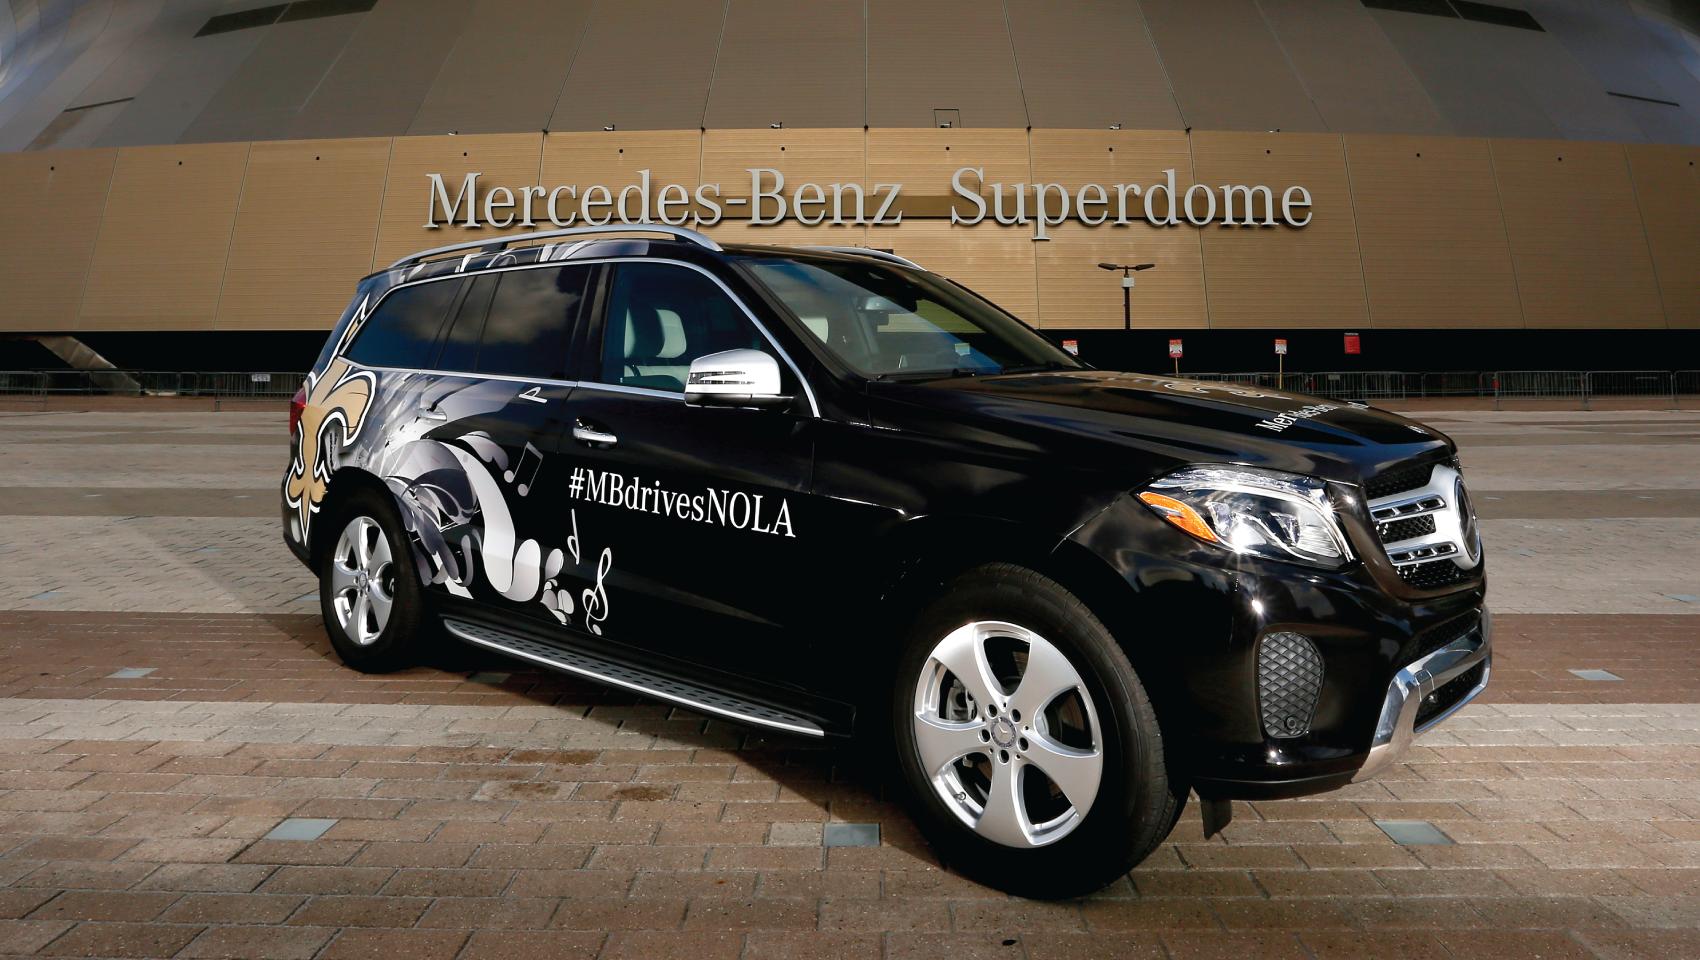 Mercedes benz vip gameday package giveaway uber for Mercedes benz nola